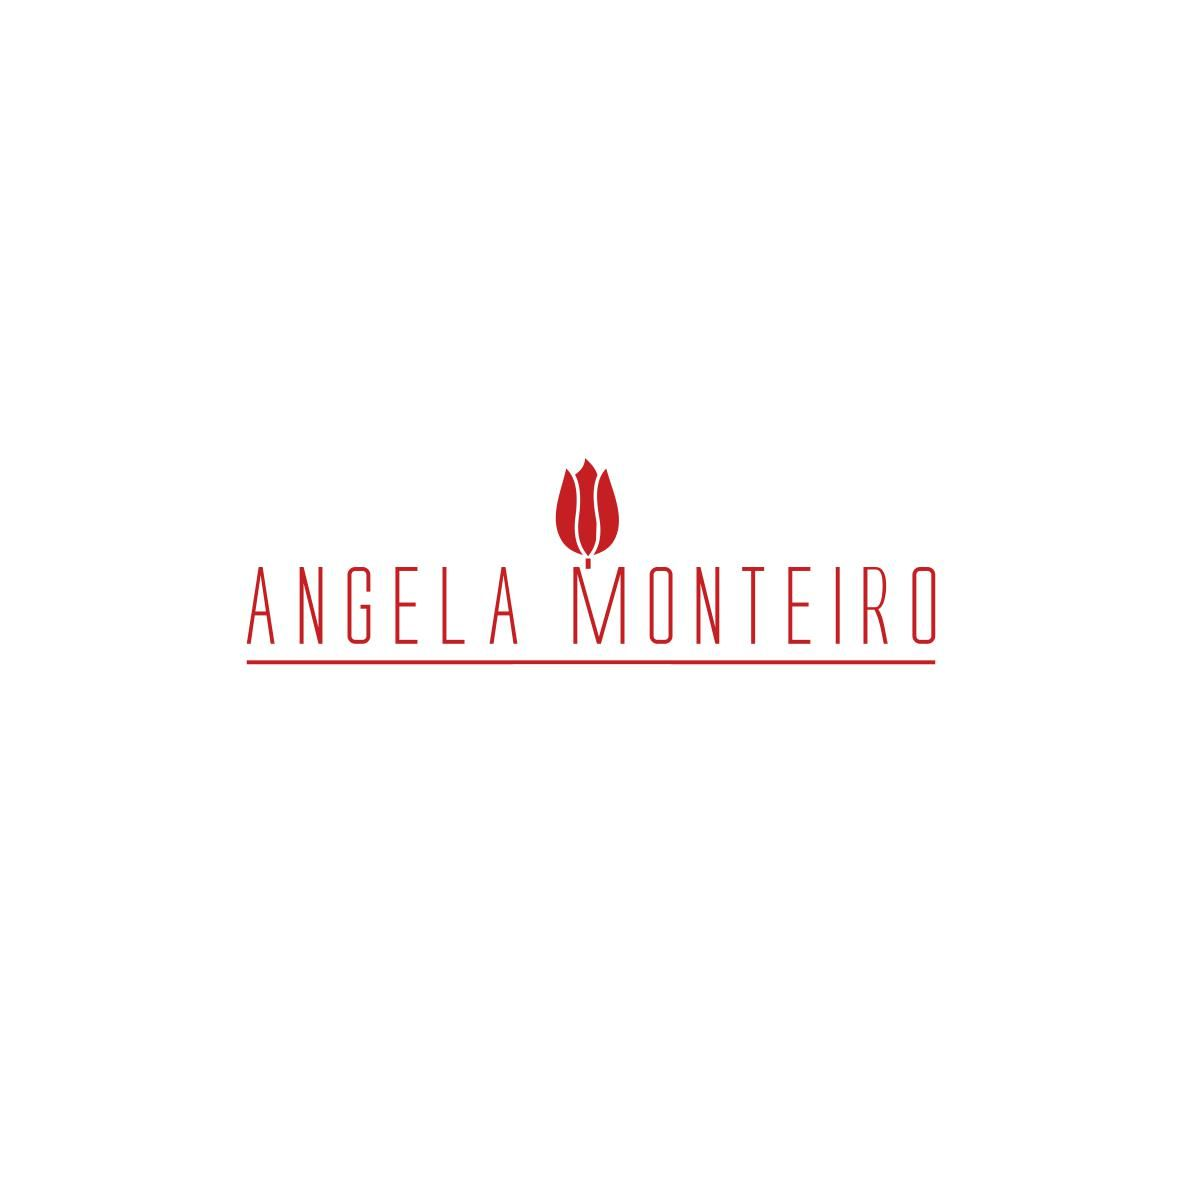 Angela Monteiro